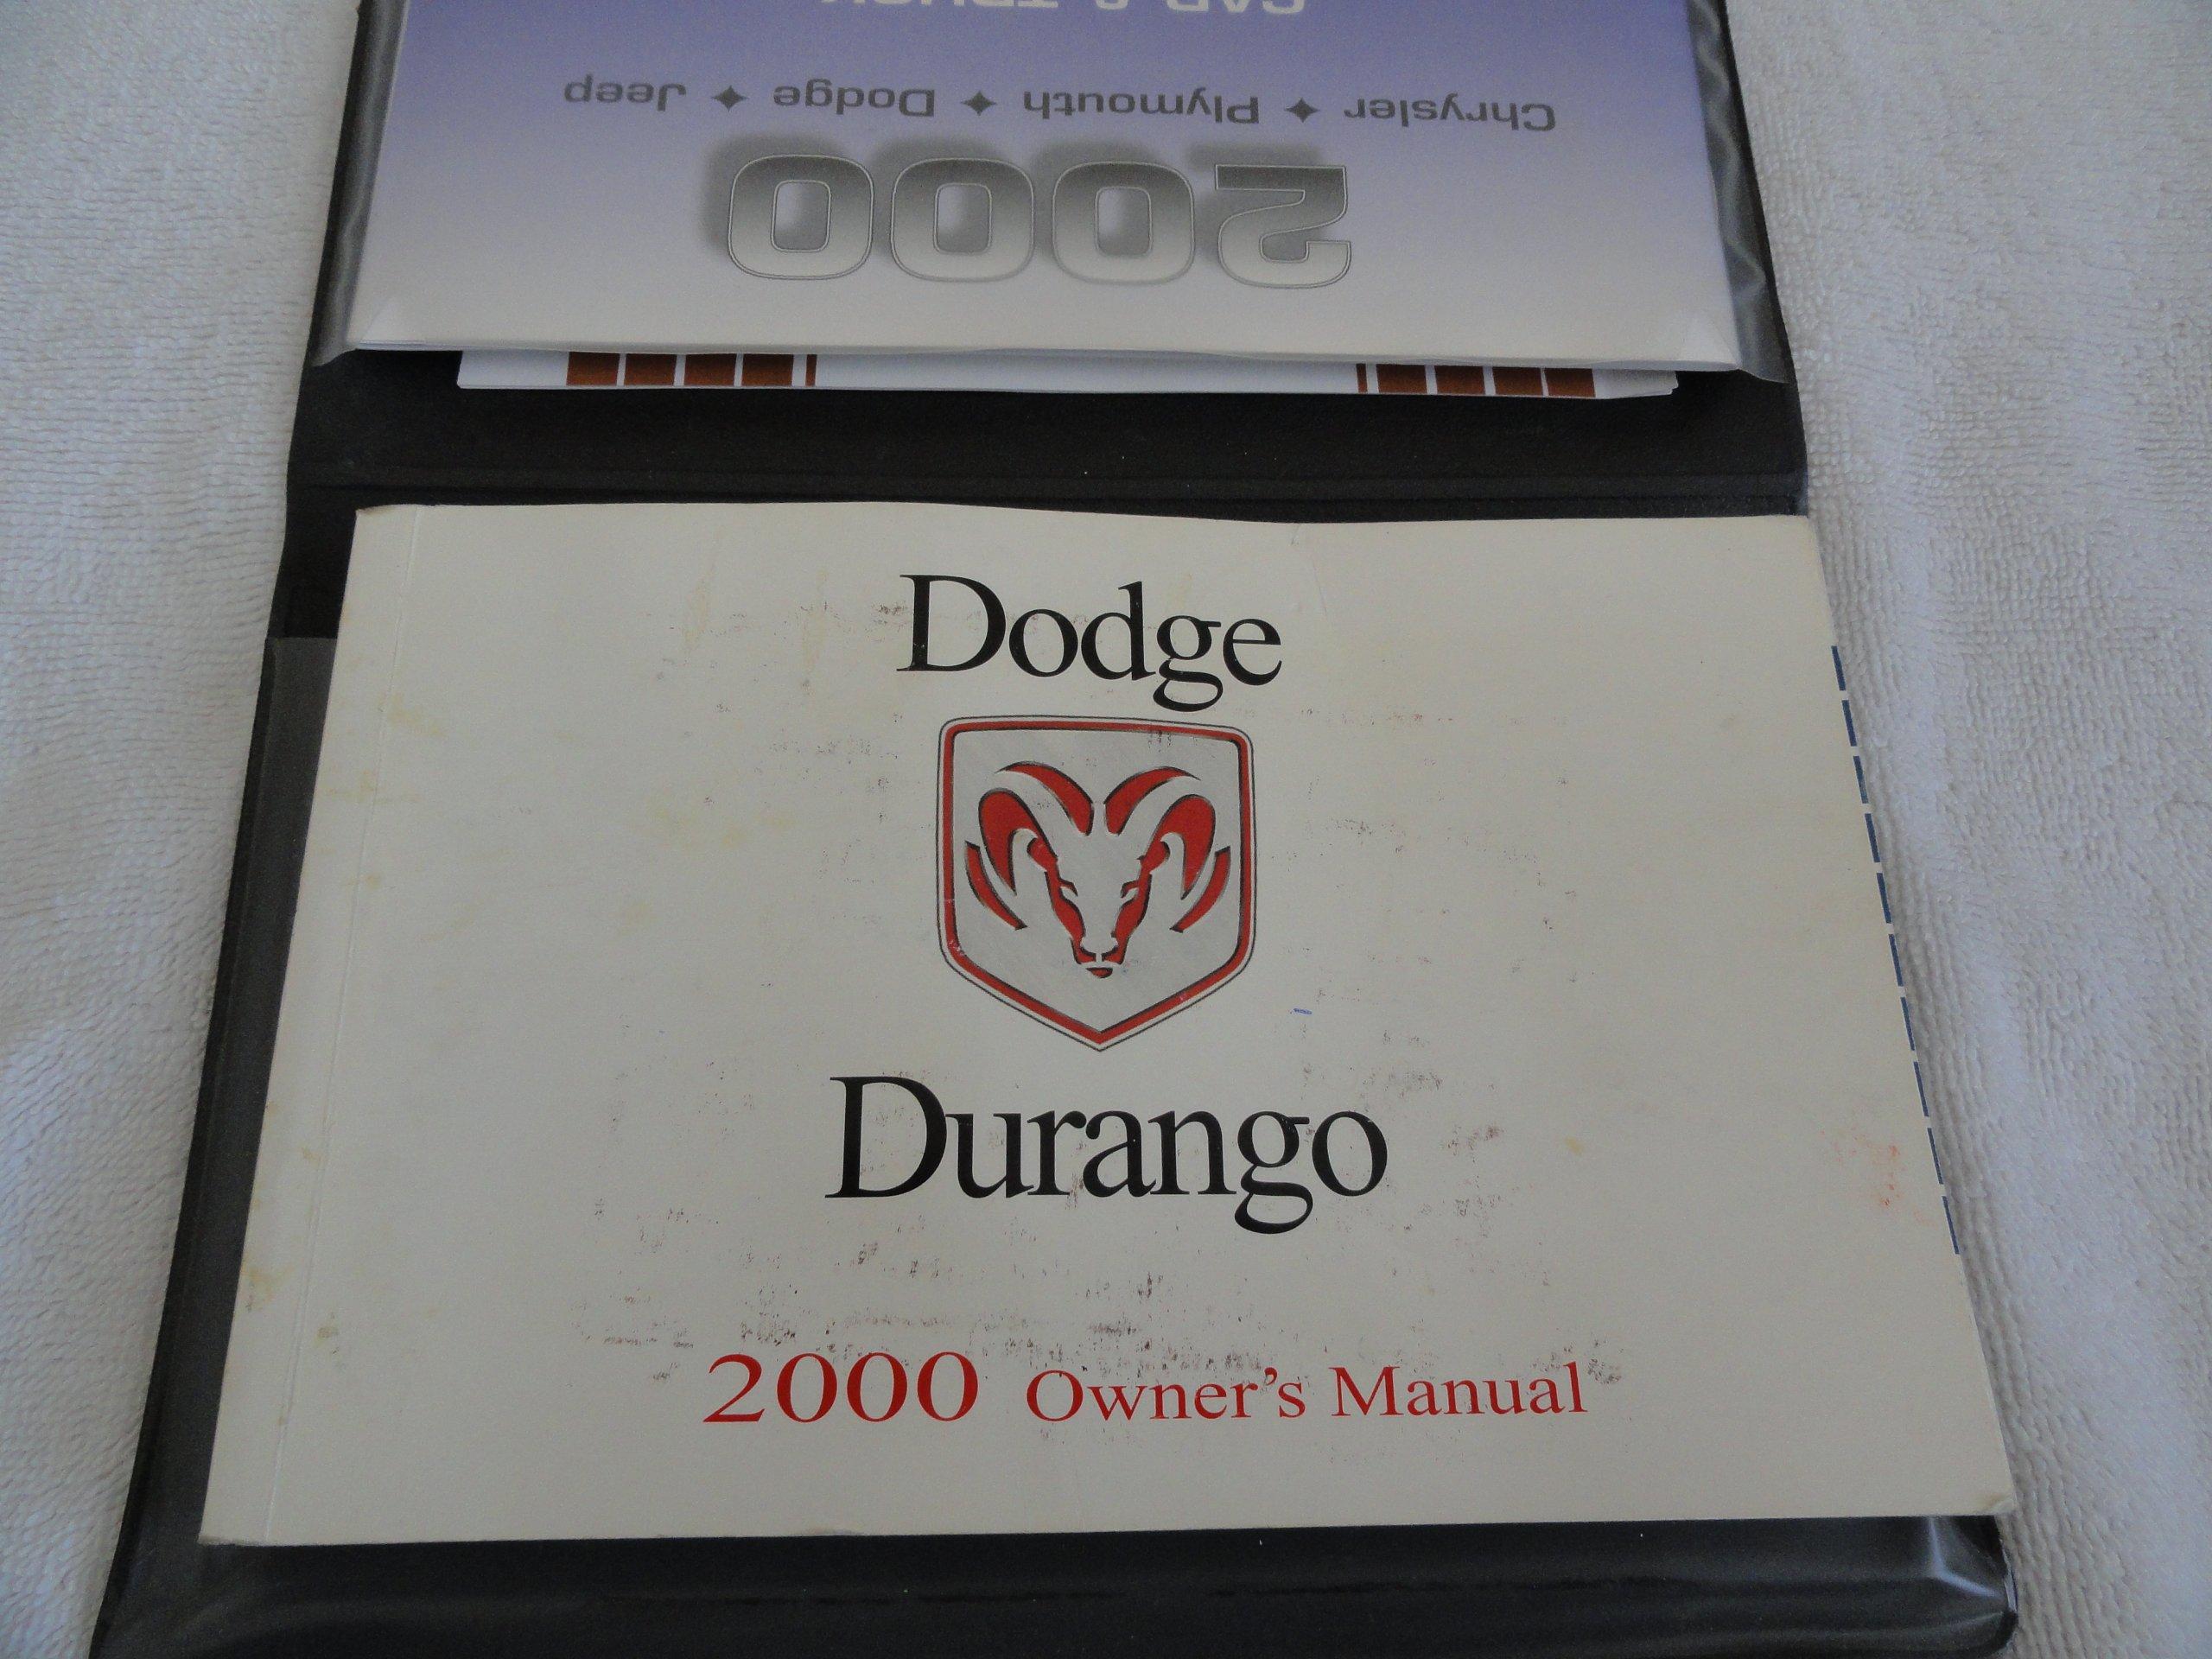 2000 Dodge Durango owners manual: DaimlerChrysler Corporation:  0740671106327: Amazon.com: Books